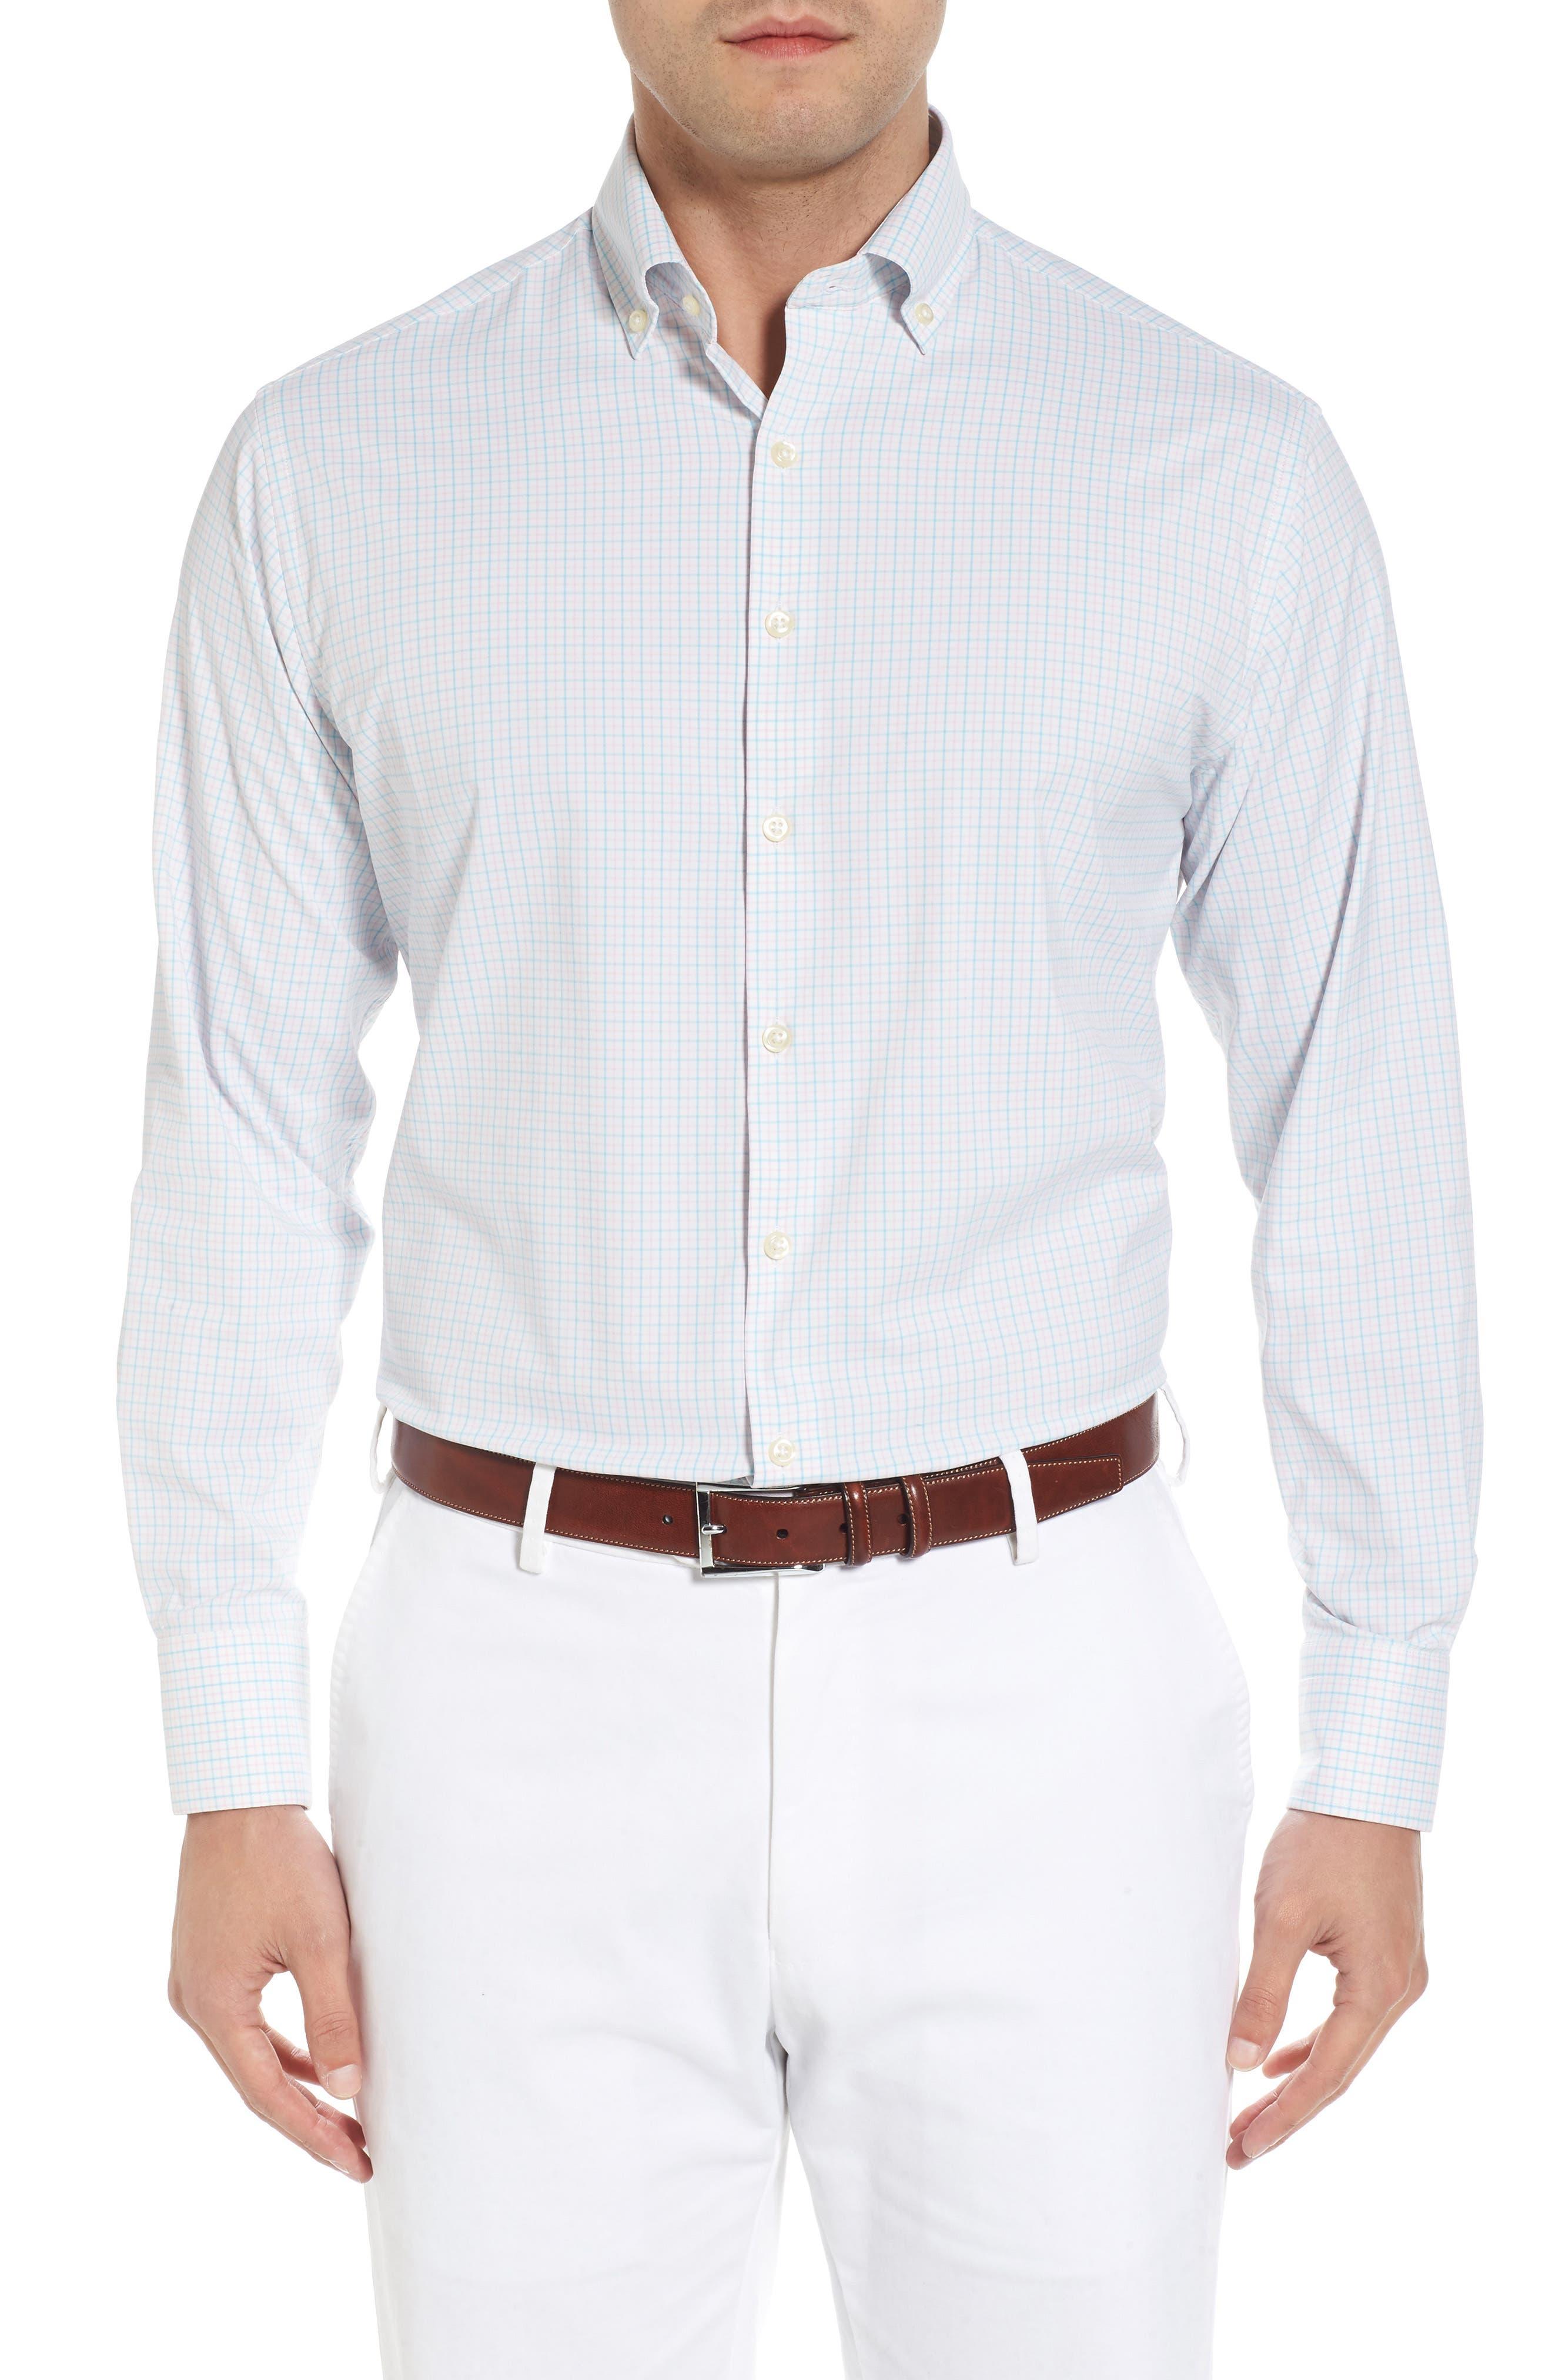 Waldorf Regular Fit Tattersall Performance Sport Shirt,                             Main thumbnail 1, color,                             White/ Piglet Pink